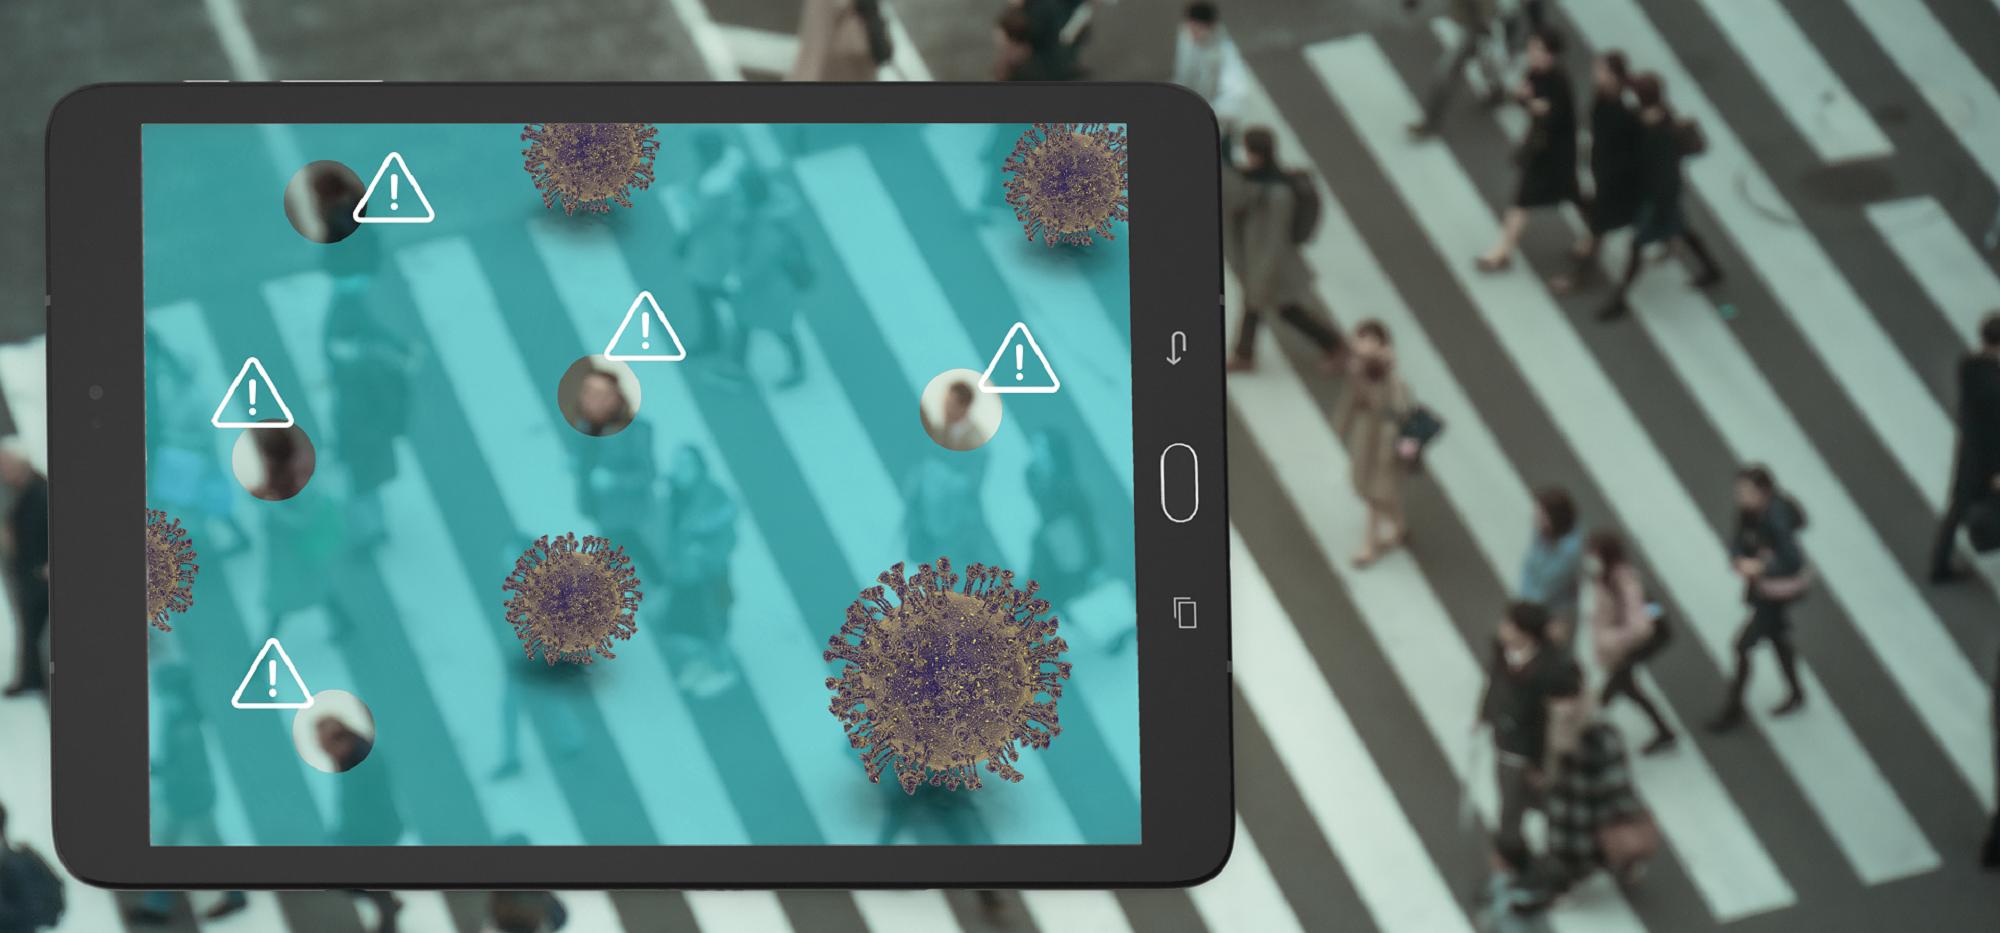 Nagarro develops AI powered solutions to mitigate COVID19 risks